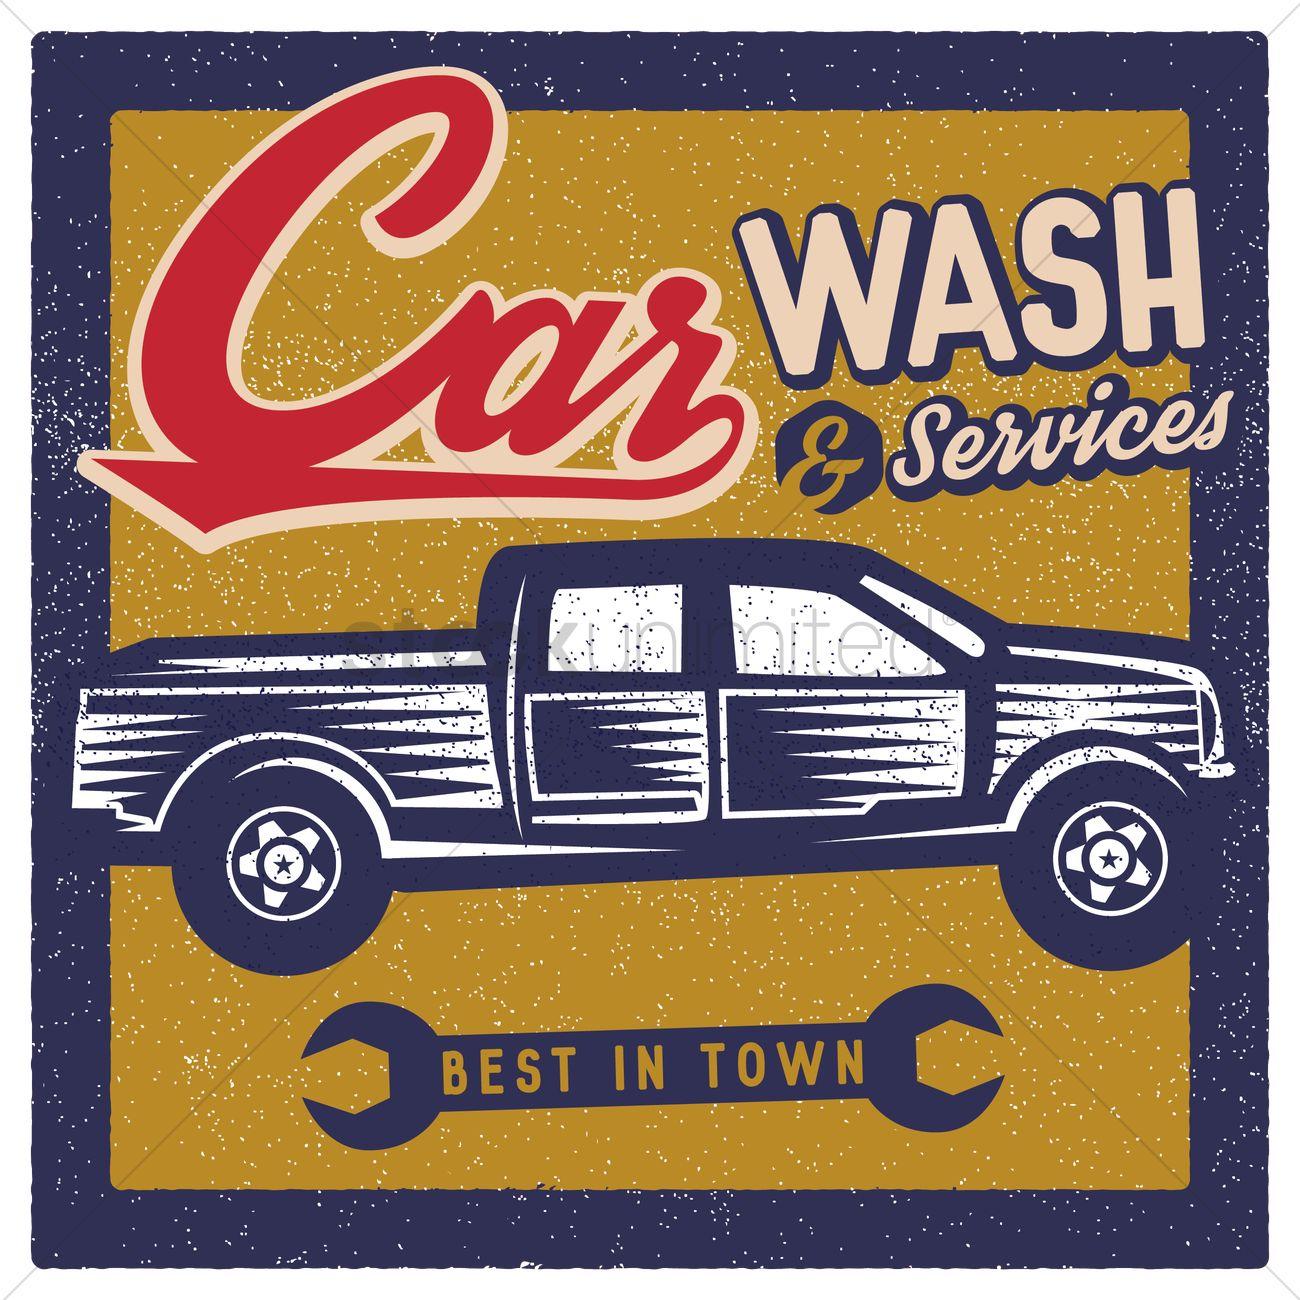 Car Wash Wallpaper Vector Image 1566342 Stockunlimited